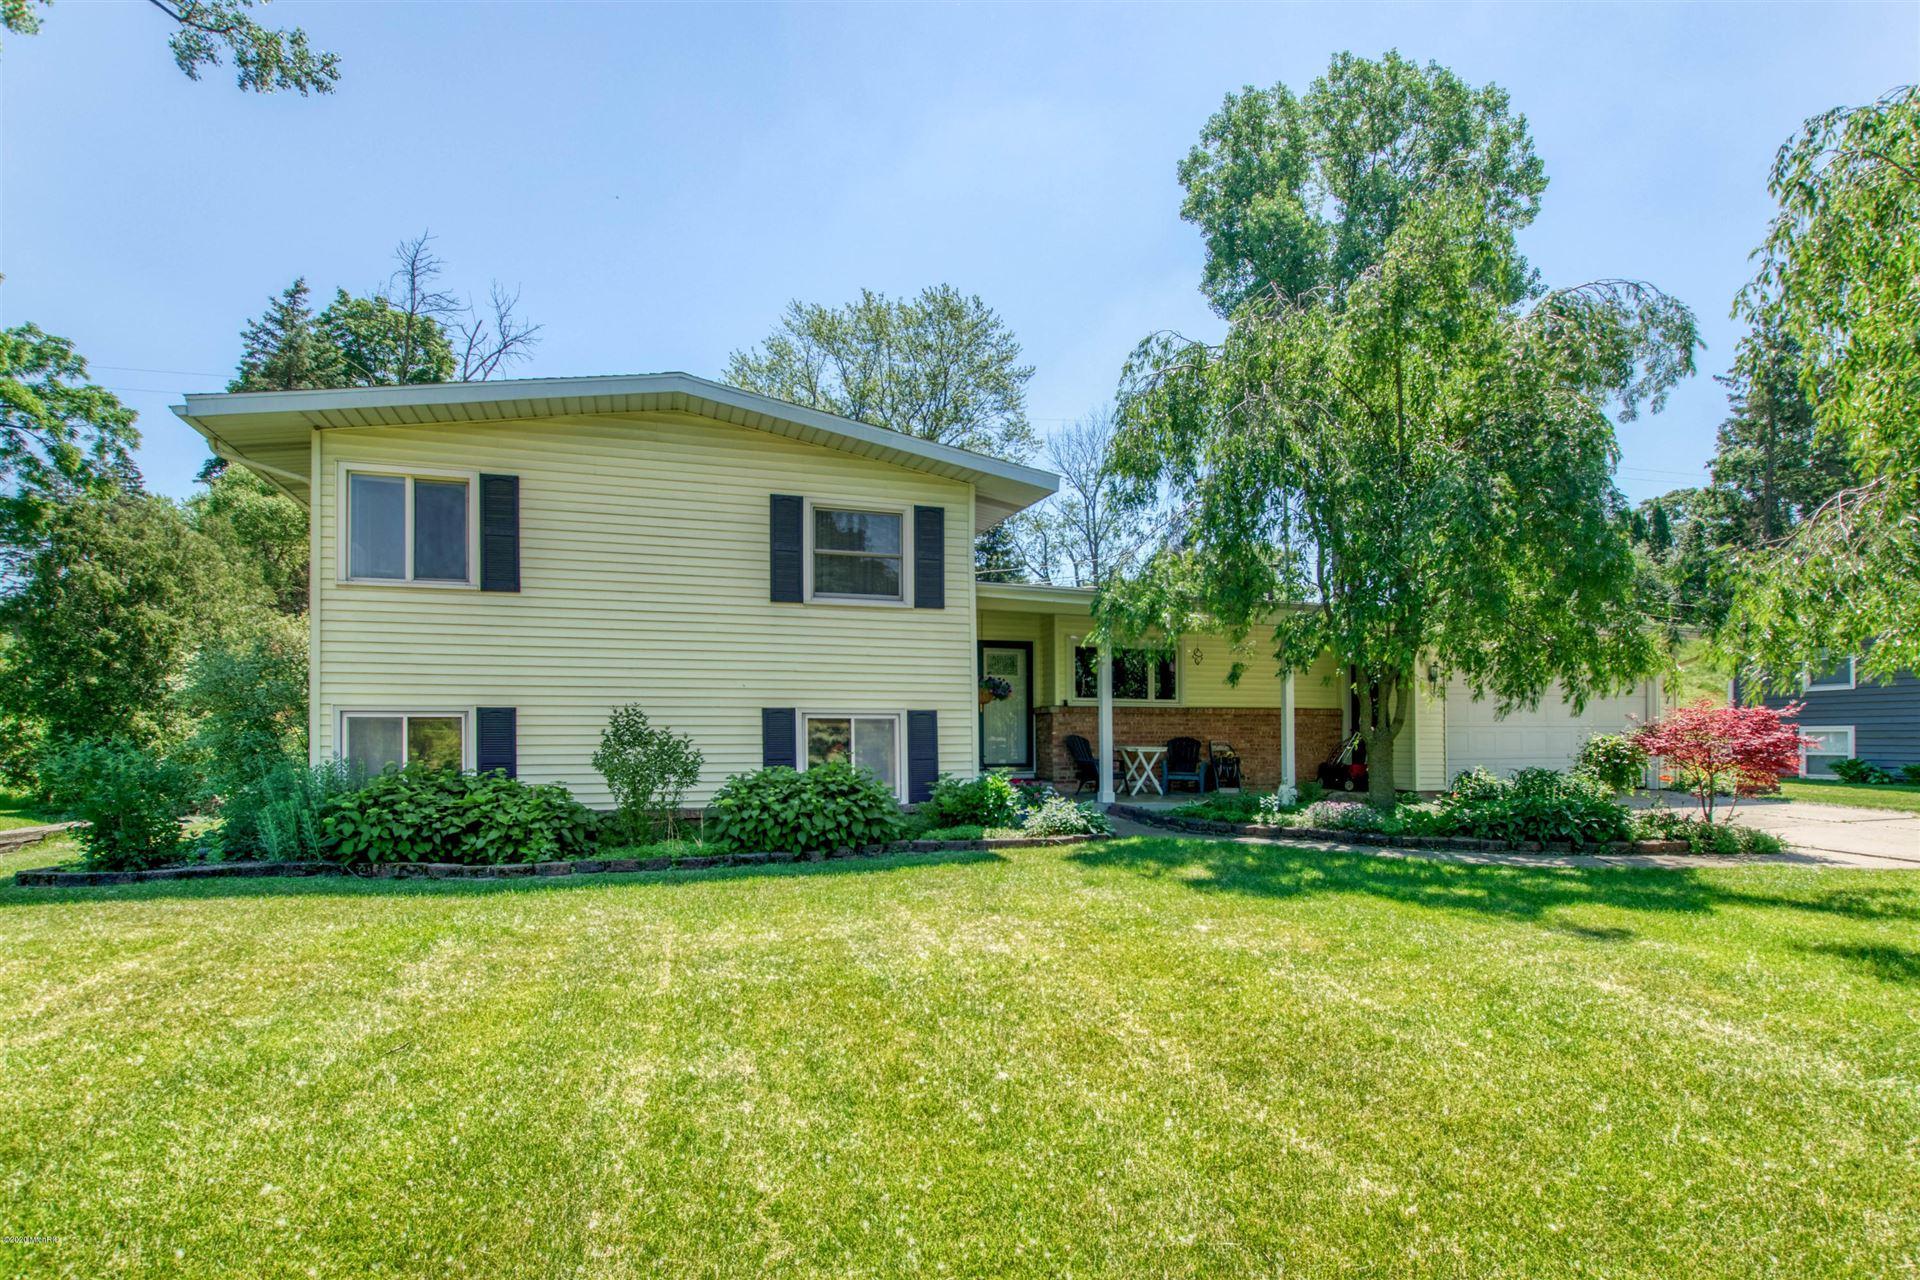 Photo of 116 Robinhood Drive NE, Grand Rapids, MI 49546 (MLS # 20023865)